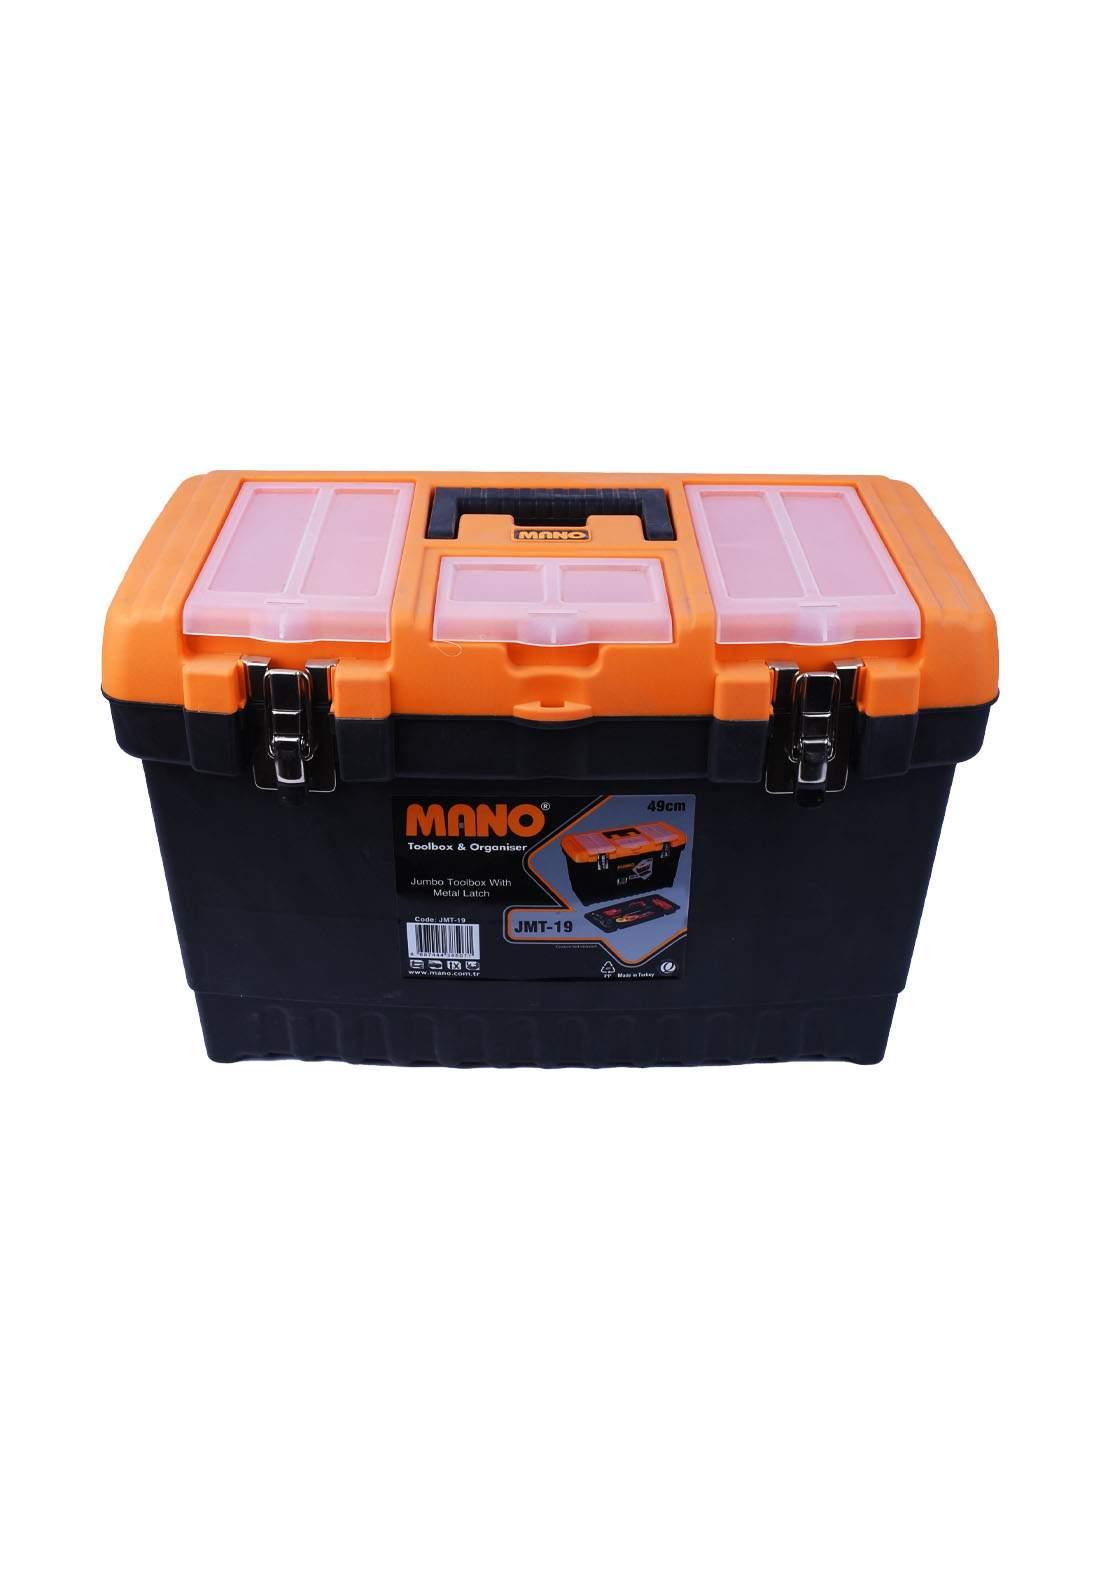 Mano JMT-19 49cm Toolbox With Metal Latch حافظة عدد يدوية